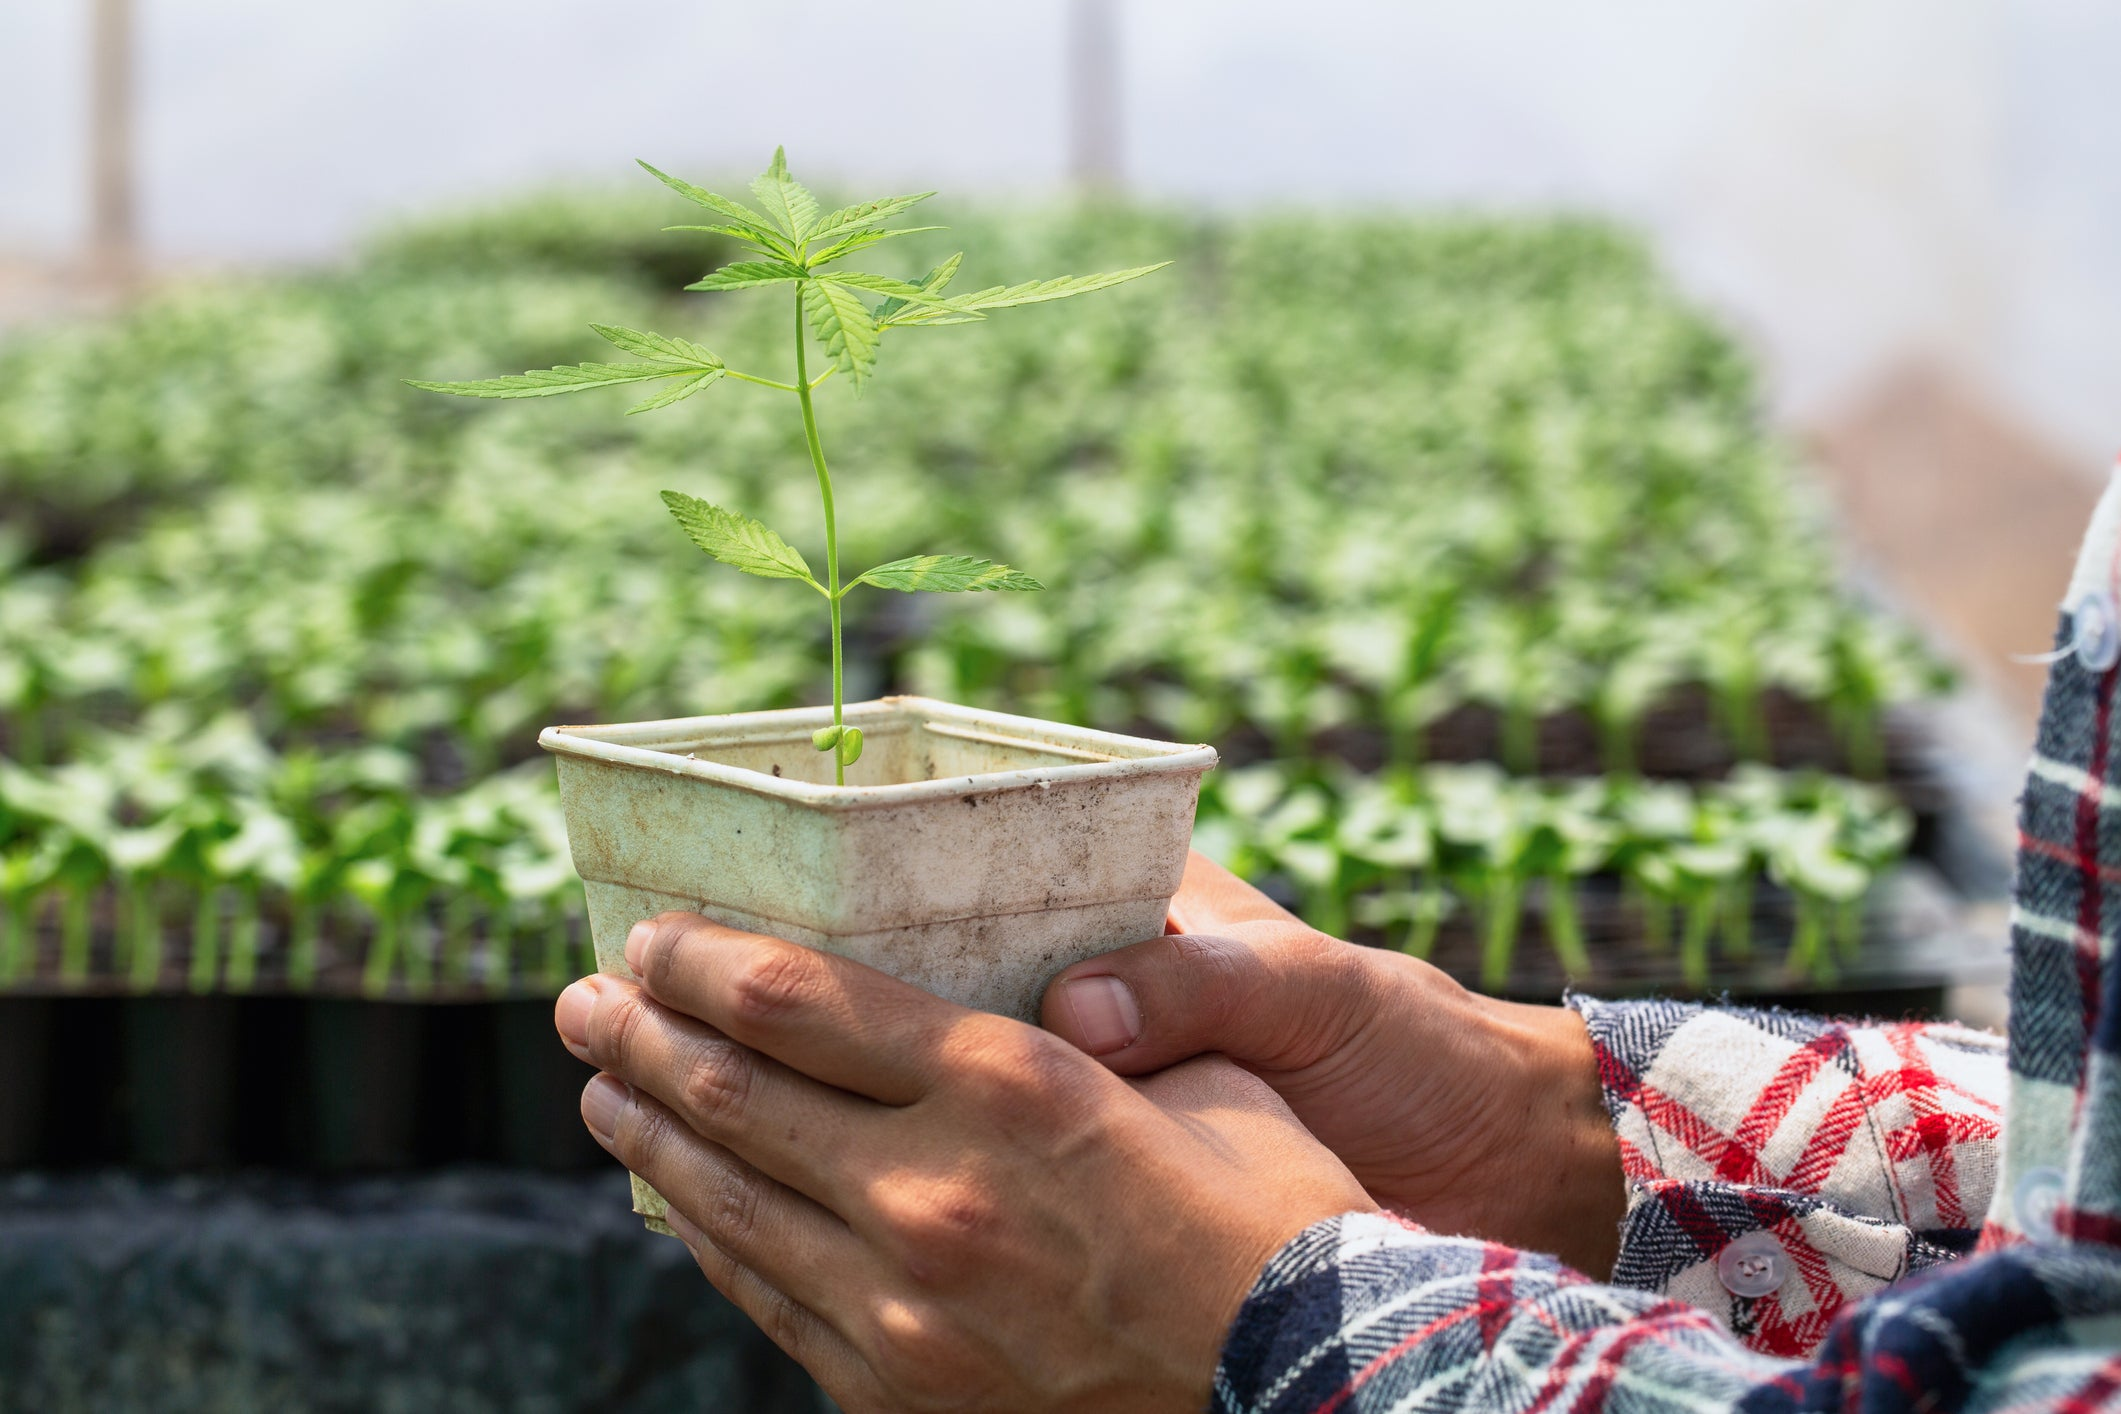 Better Cannabis Stock: Aurora Cannabis or Canopy Growth?